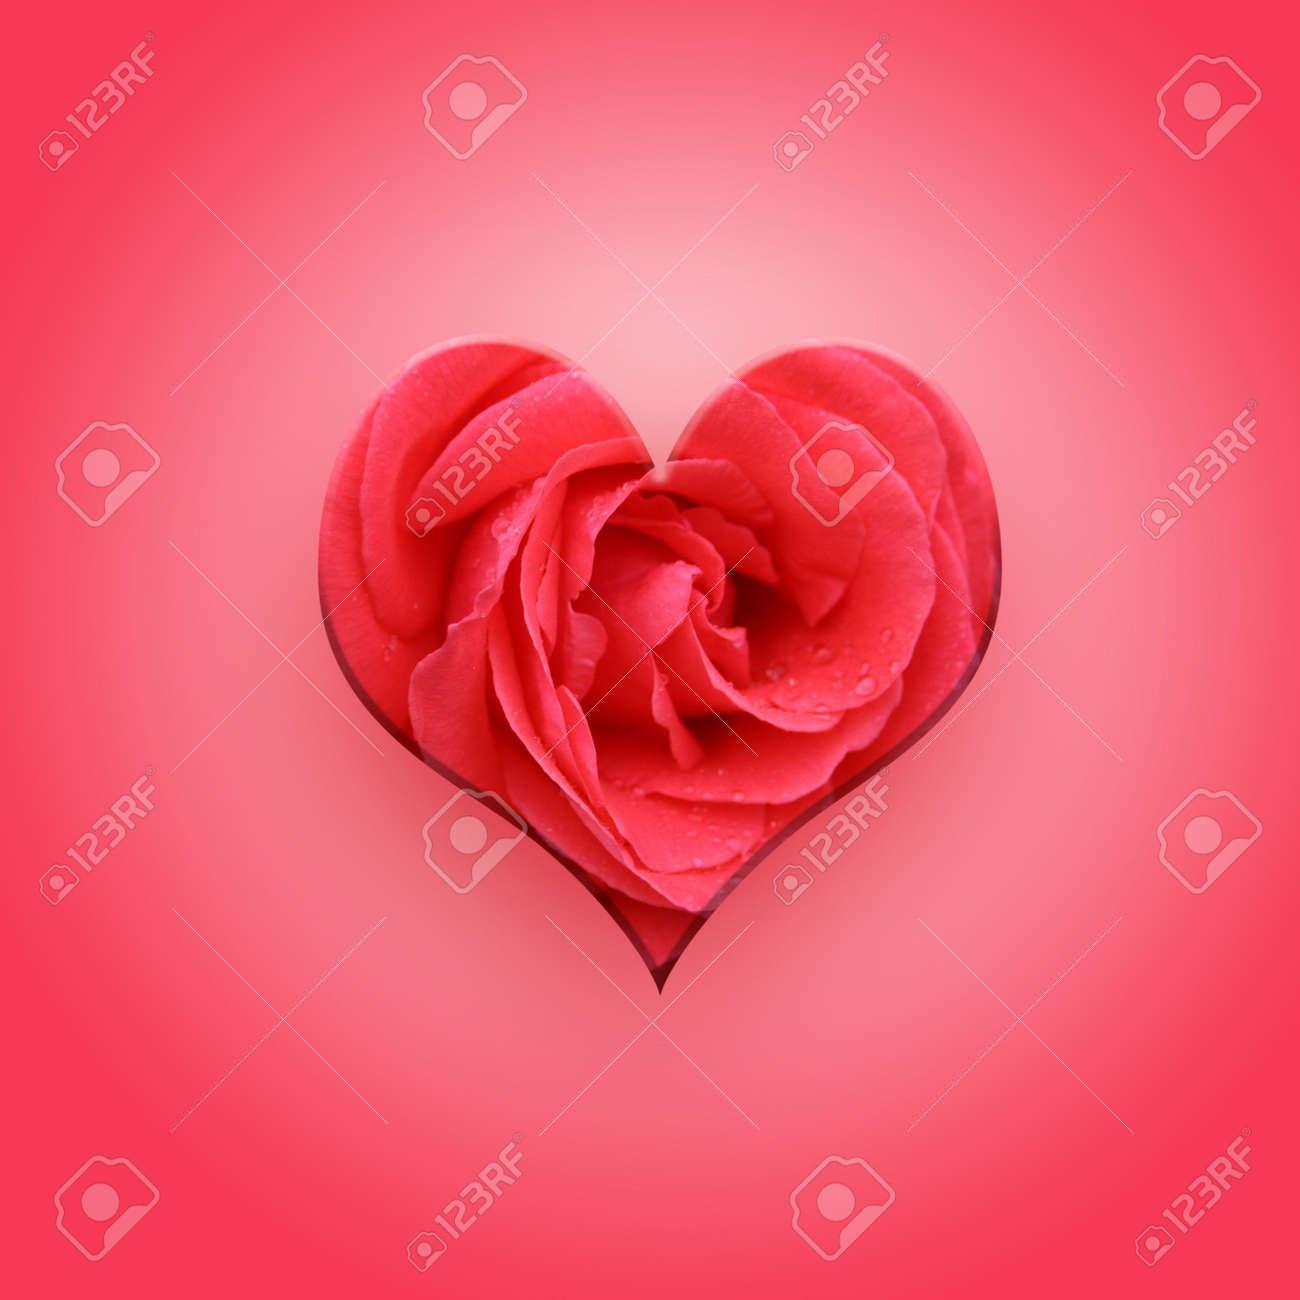 Heart Shaped Flowers New Best Image Flower Of 2018